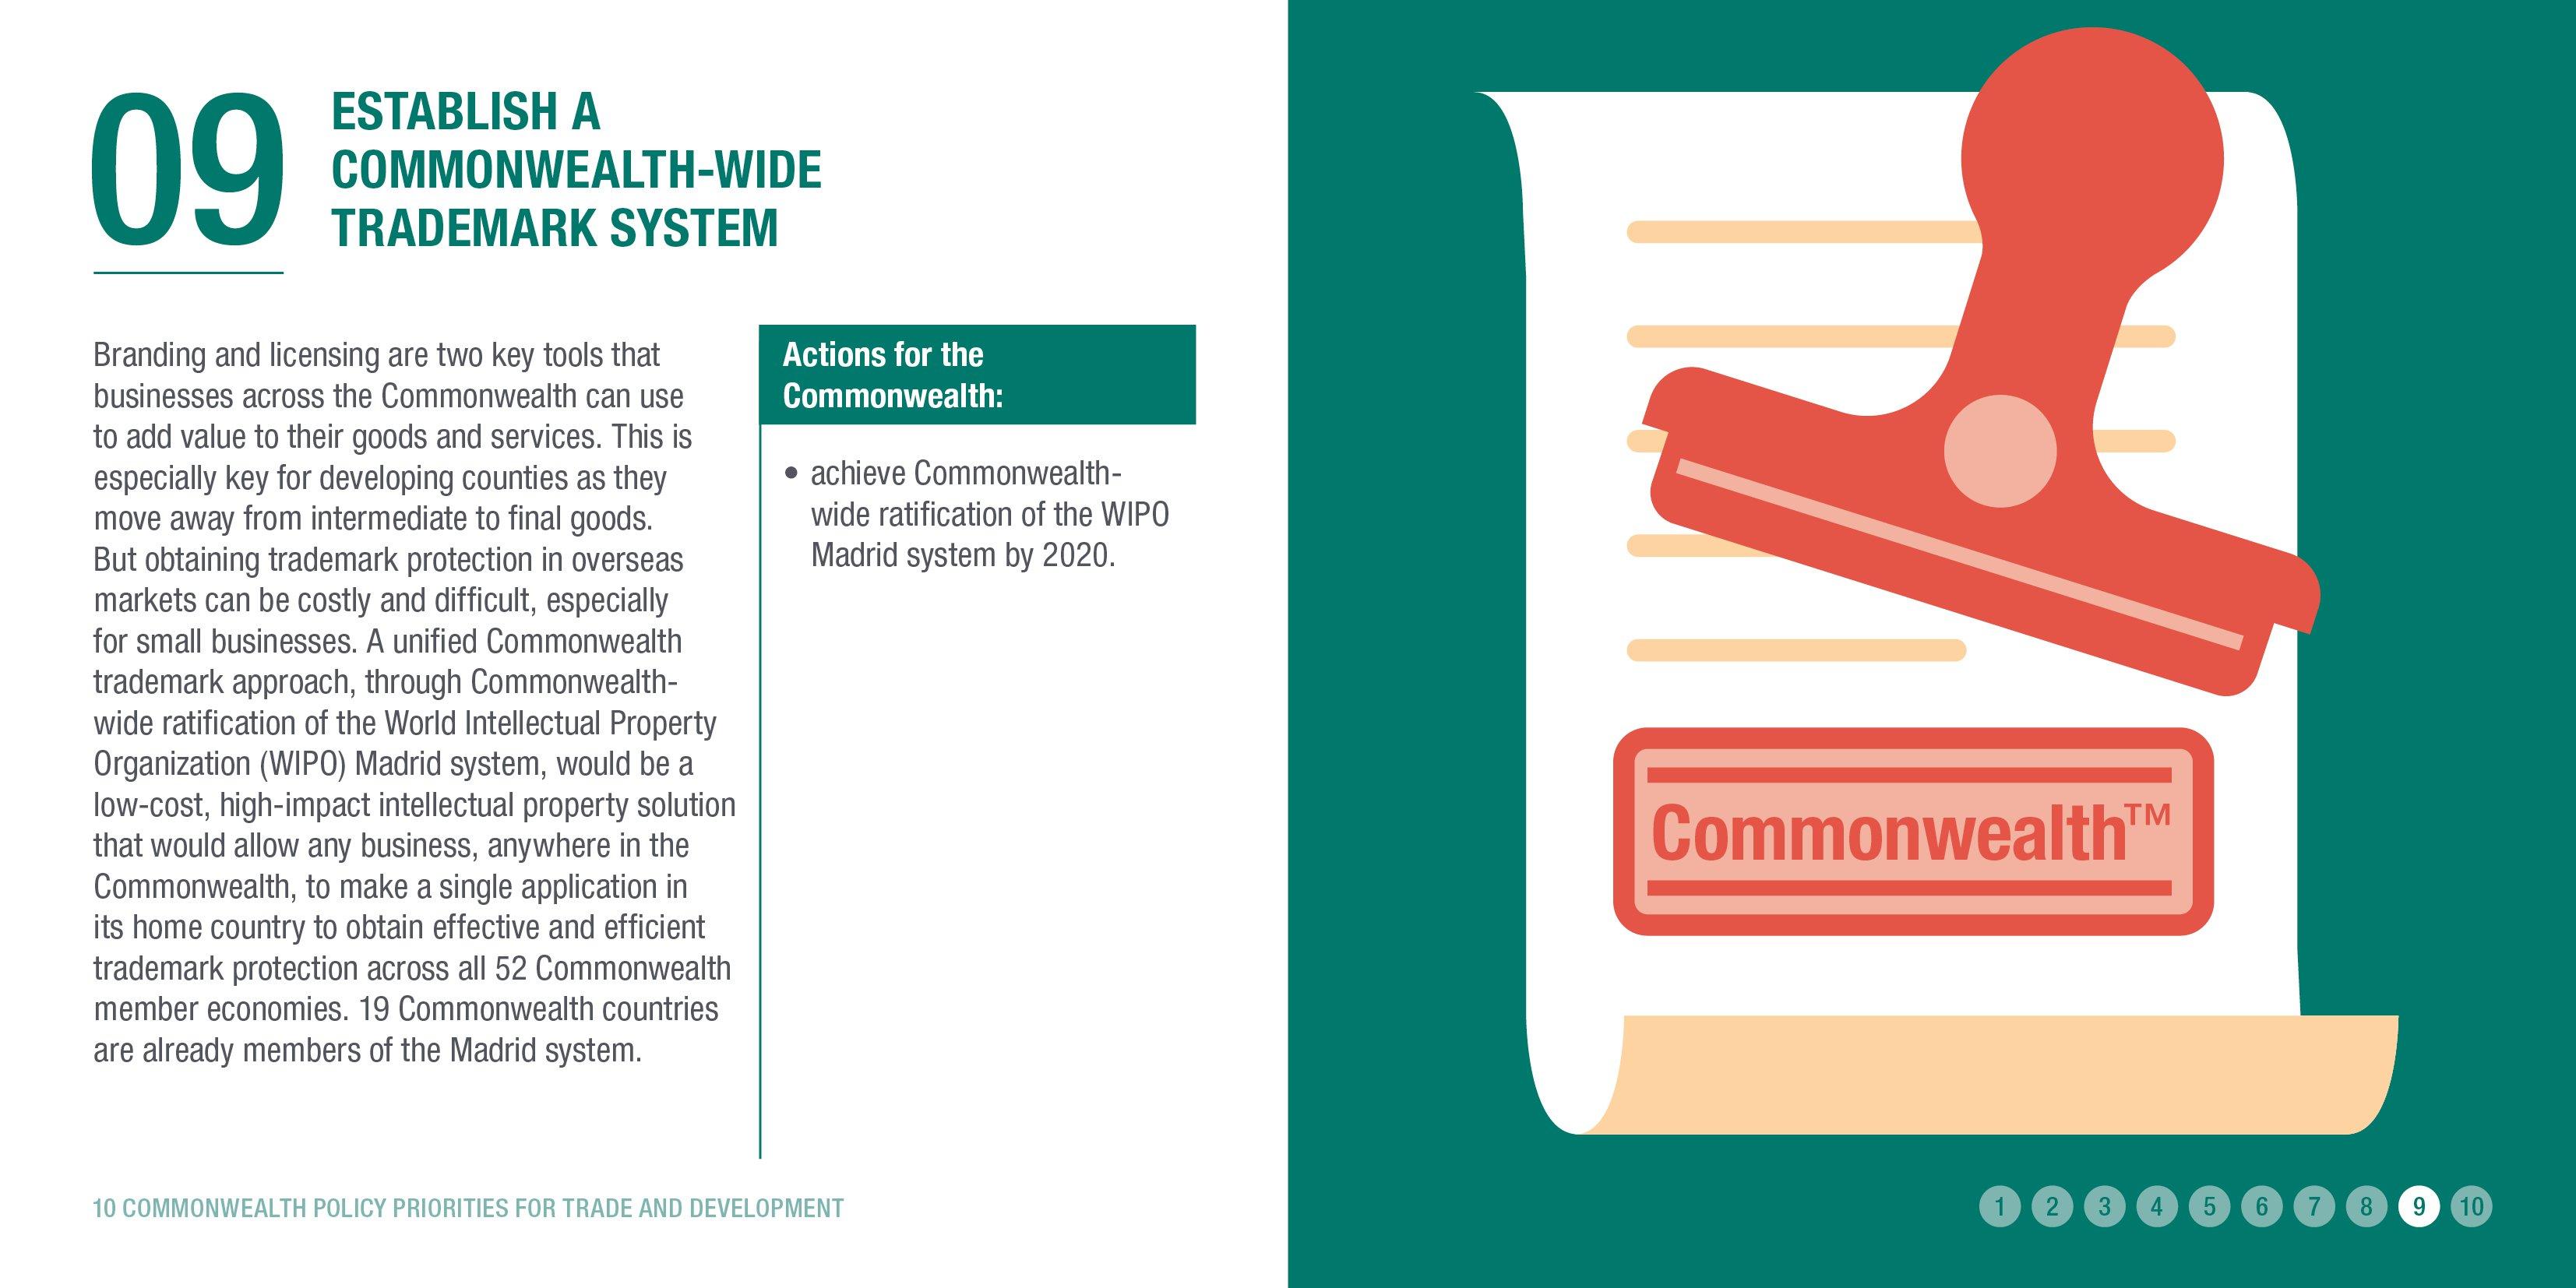 Establish a Commonwealth-wide trademark system